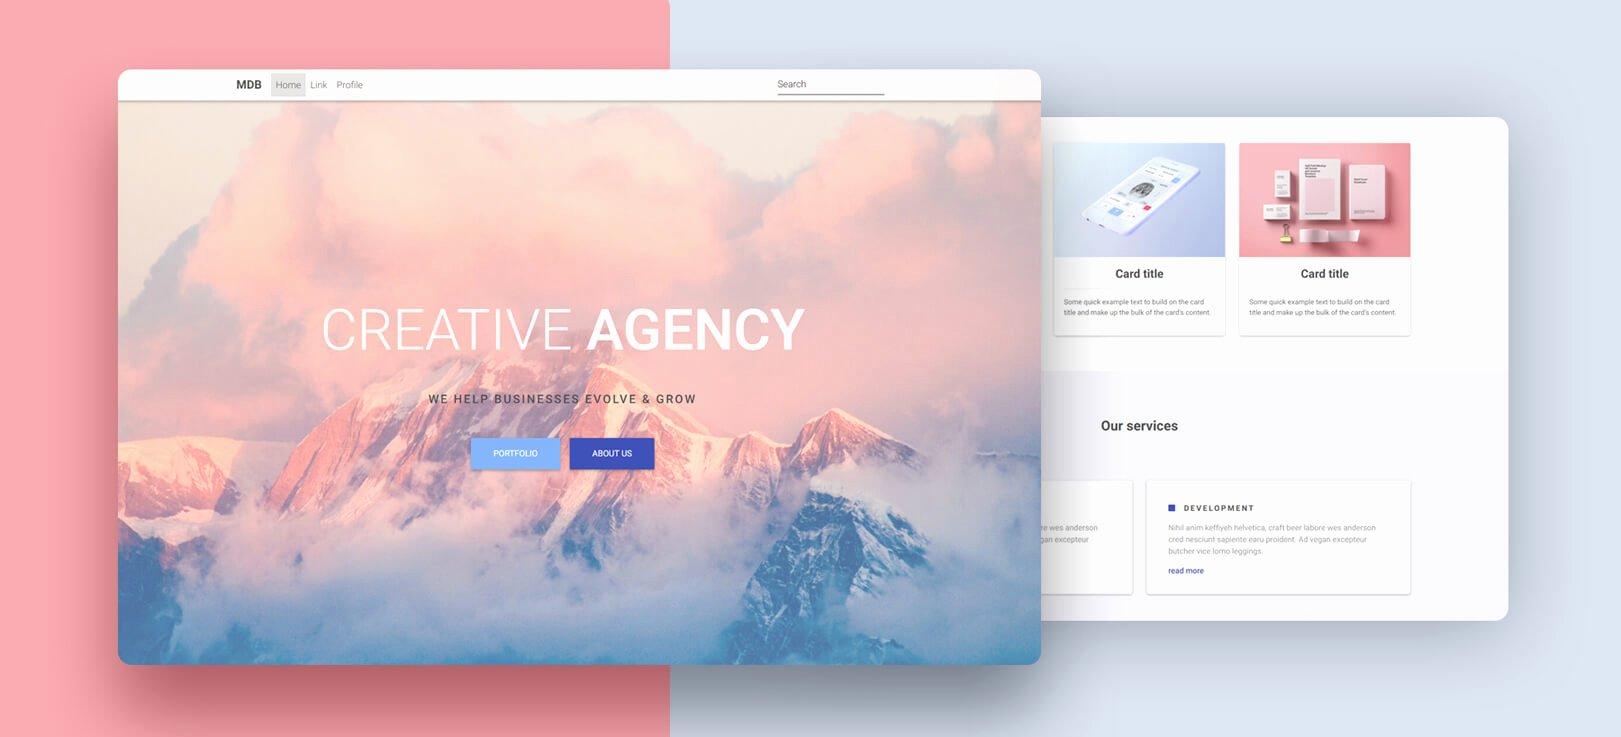 Free Portfolio Website Templates Elegant Portfolio Free Template Bootstrap 4 & Material Design